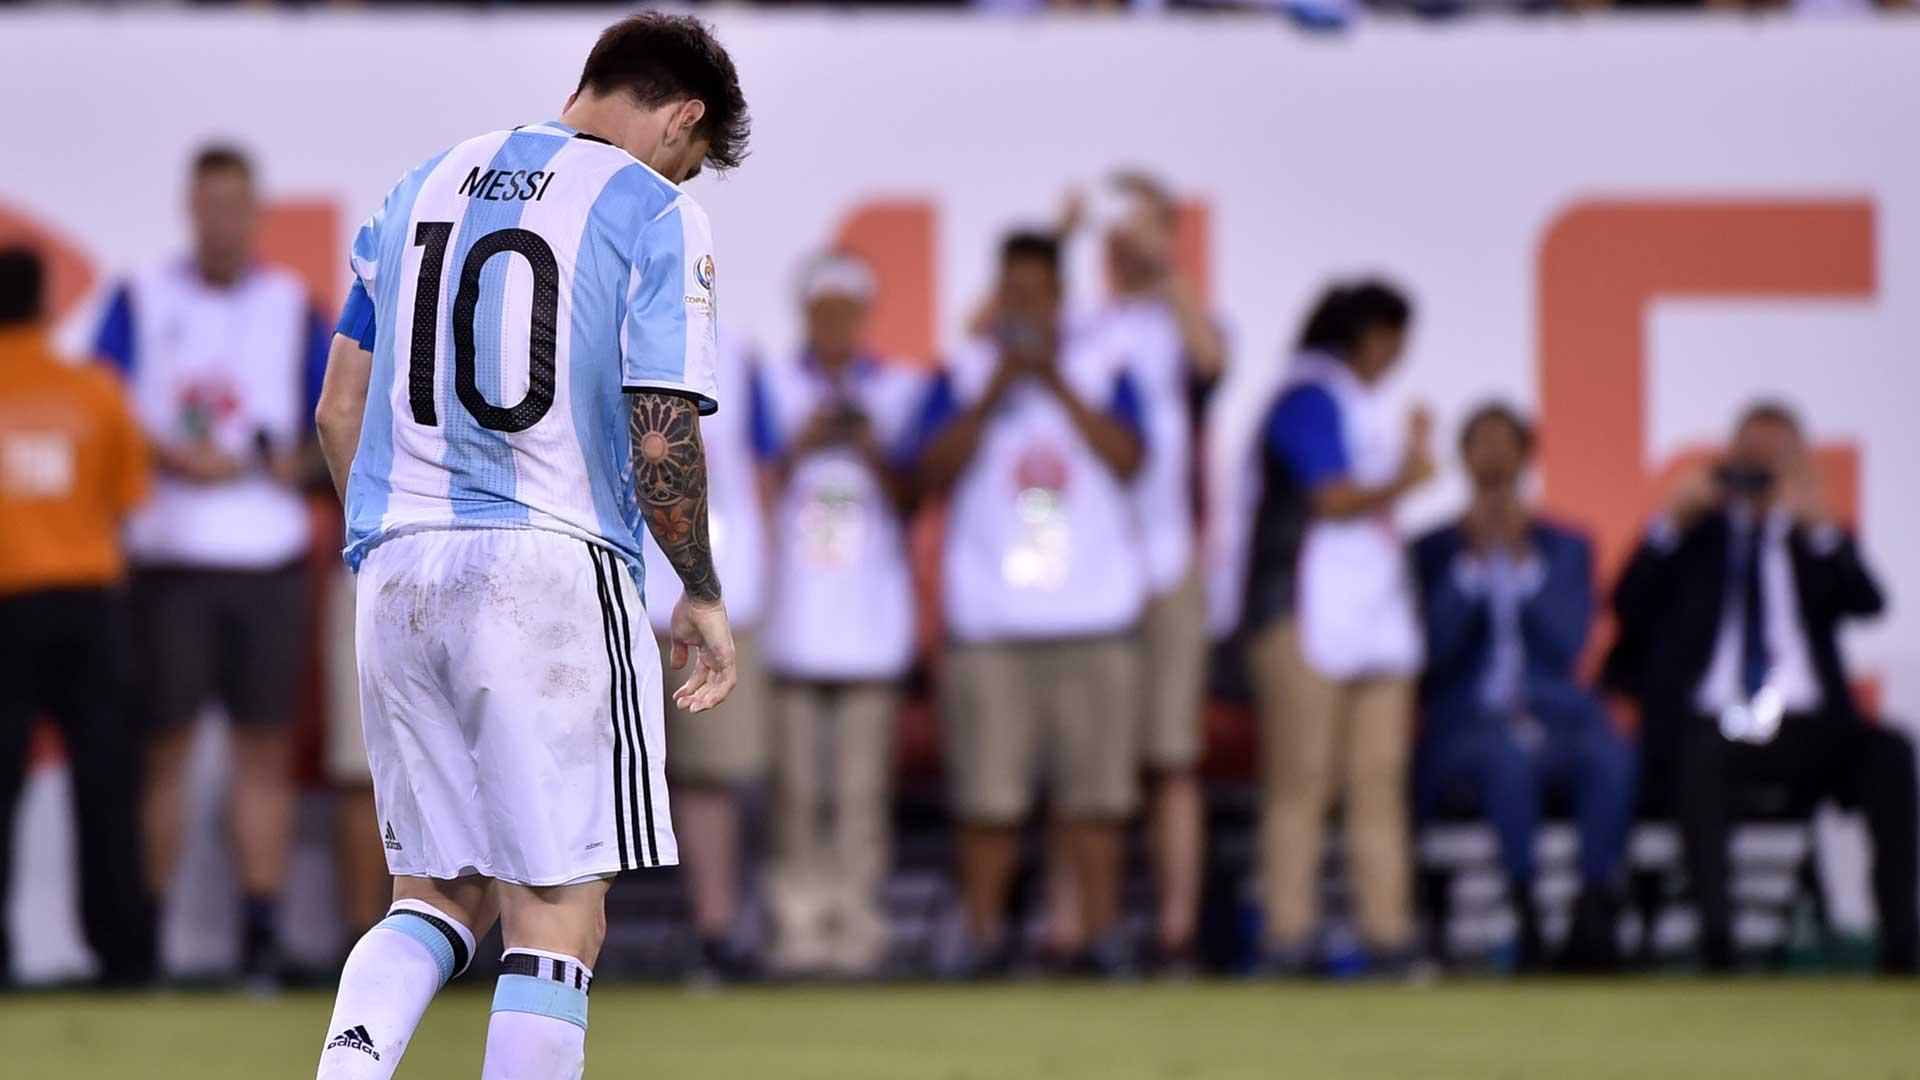 Lionel Messi Copa America 2016 Argentina 26062016